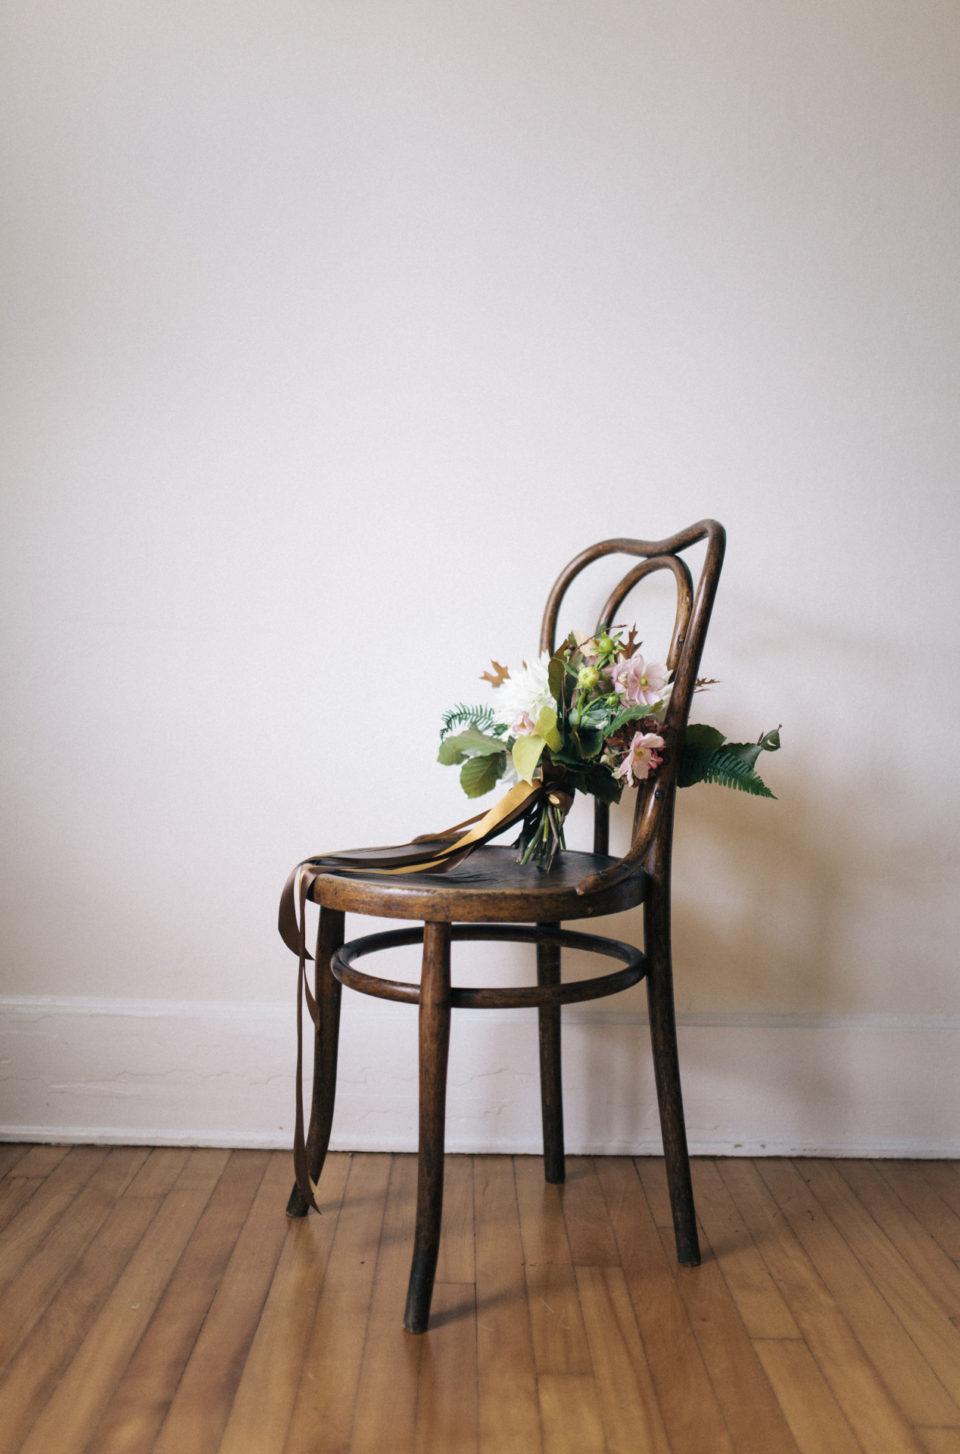 flowers decor, декор дома, цветы, интерьер, простые идеи